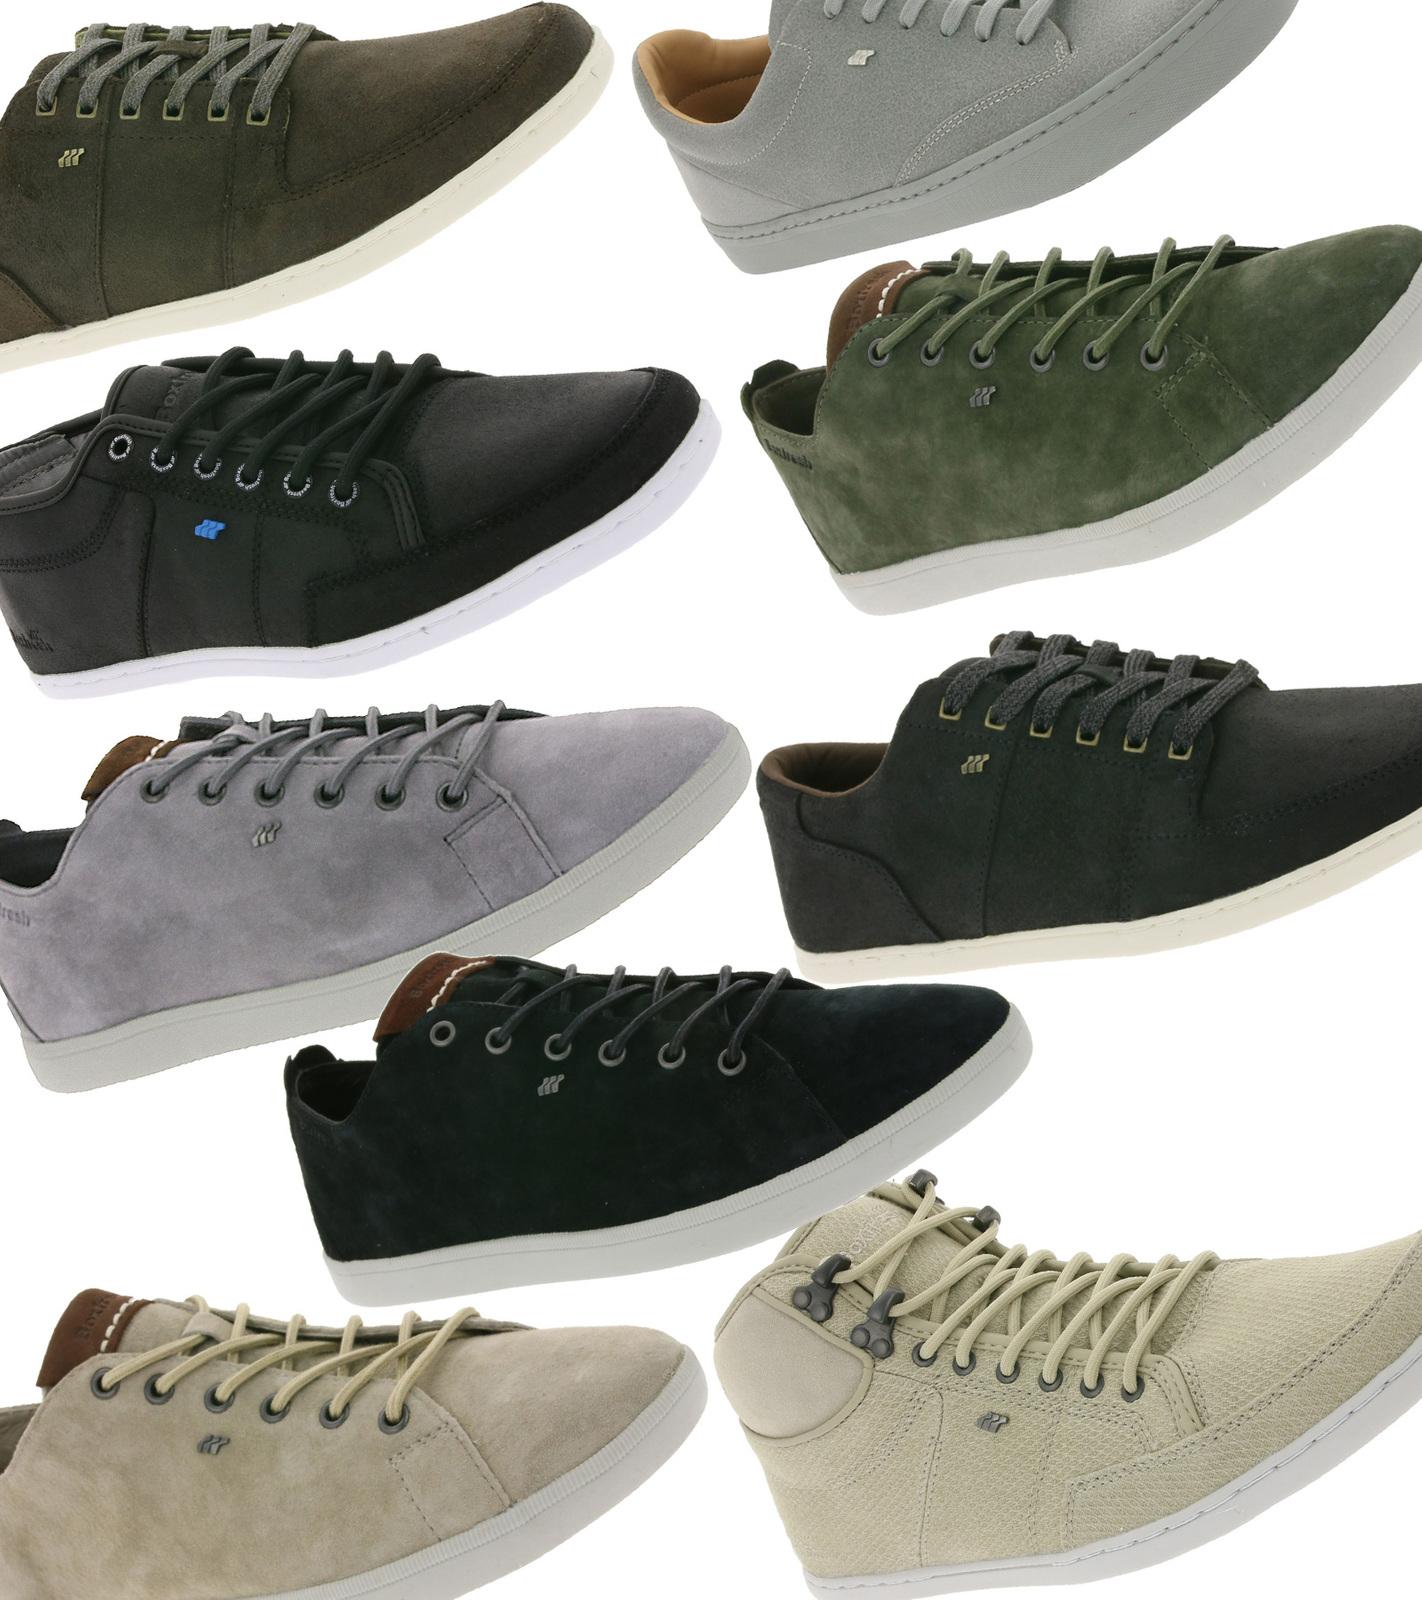 Boxfresh Herren Schuhe Veloursleder 9 Modelle Größen verfügbar! 100€ UVP